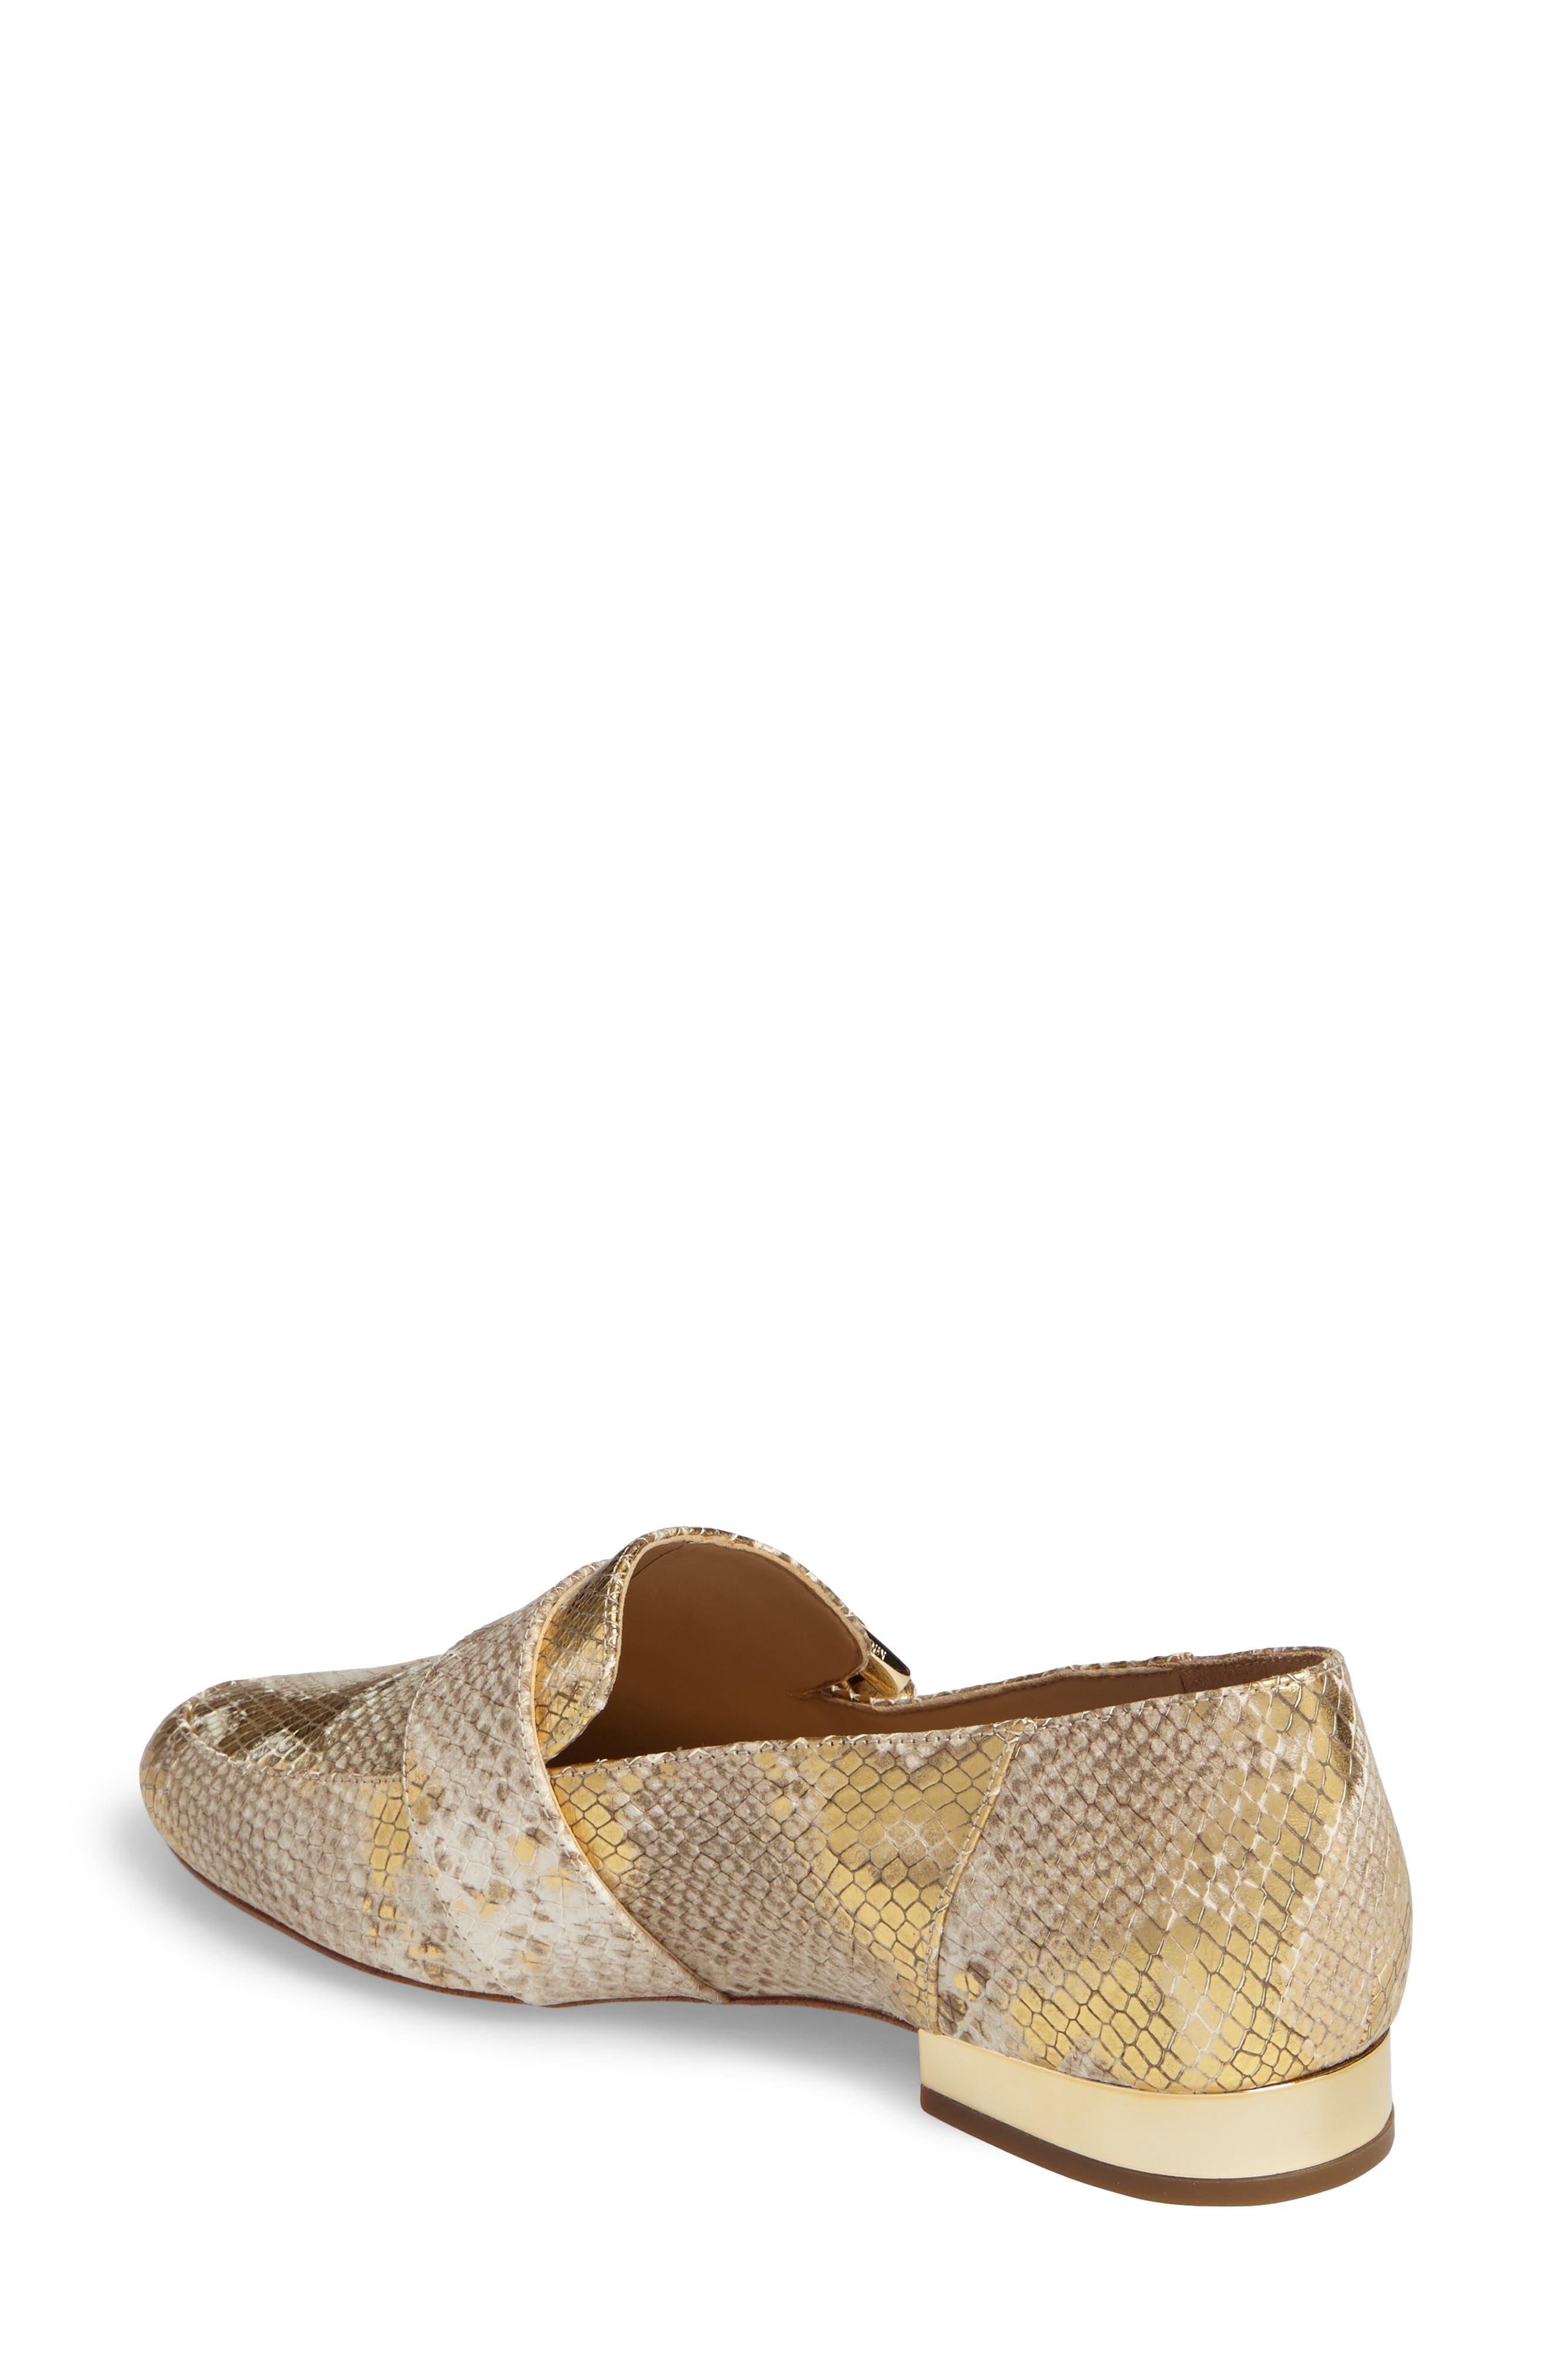 Cooper Loafer,                             Alternate thumbnail 2, color,                             Natural/ Gold Snakeskin